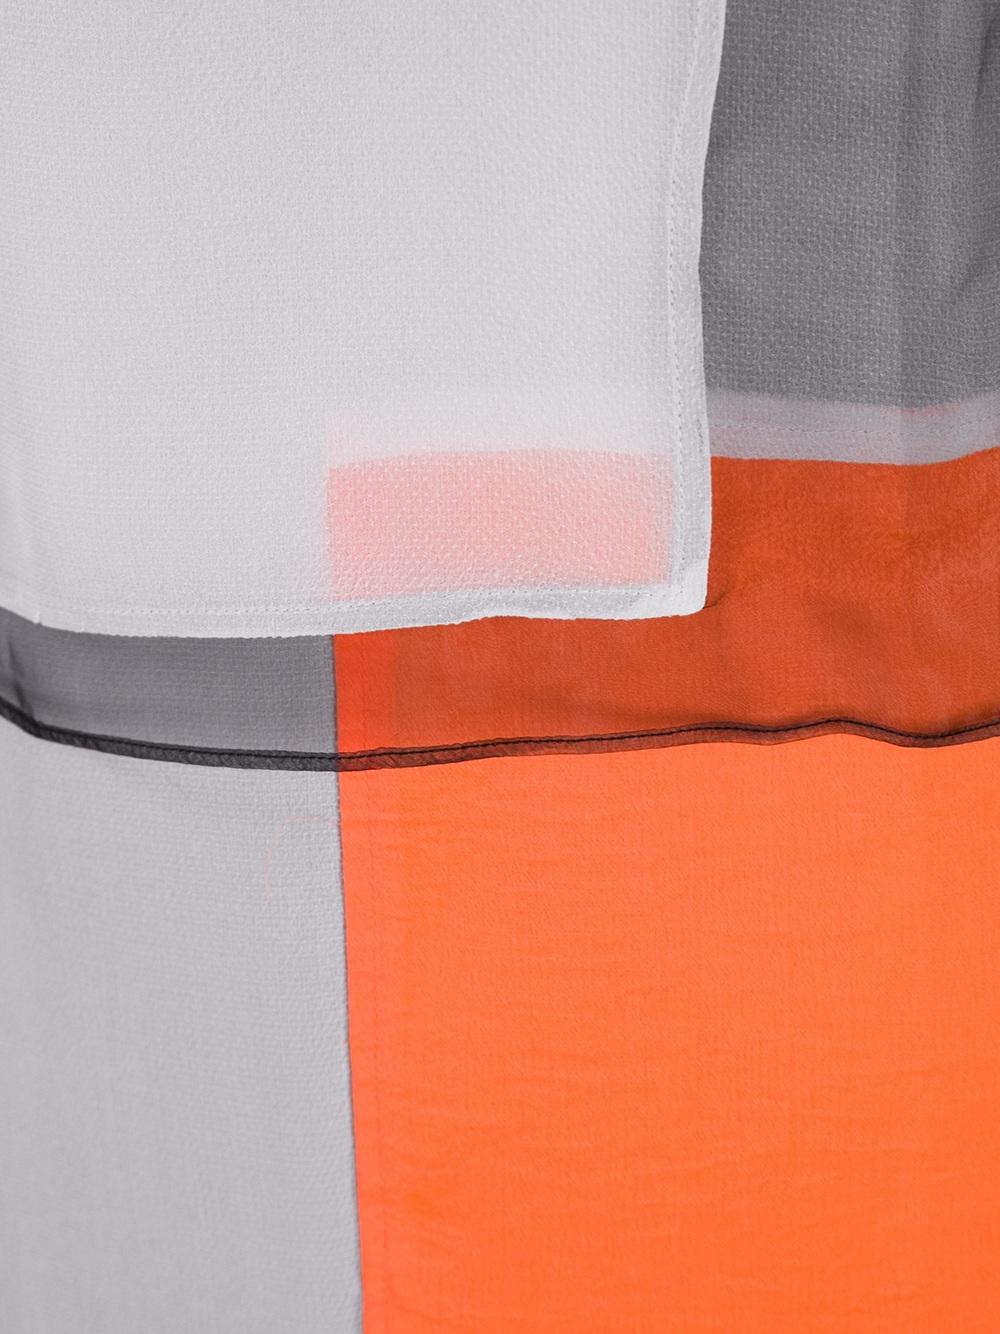 Helmut lang orange and blackshiftdress